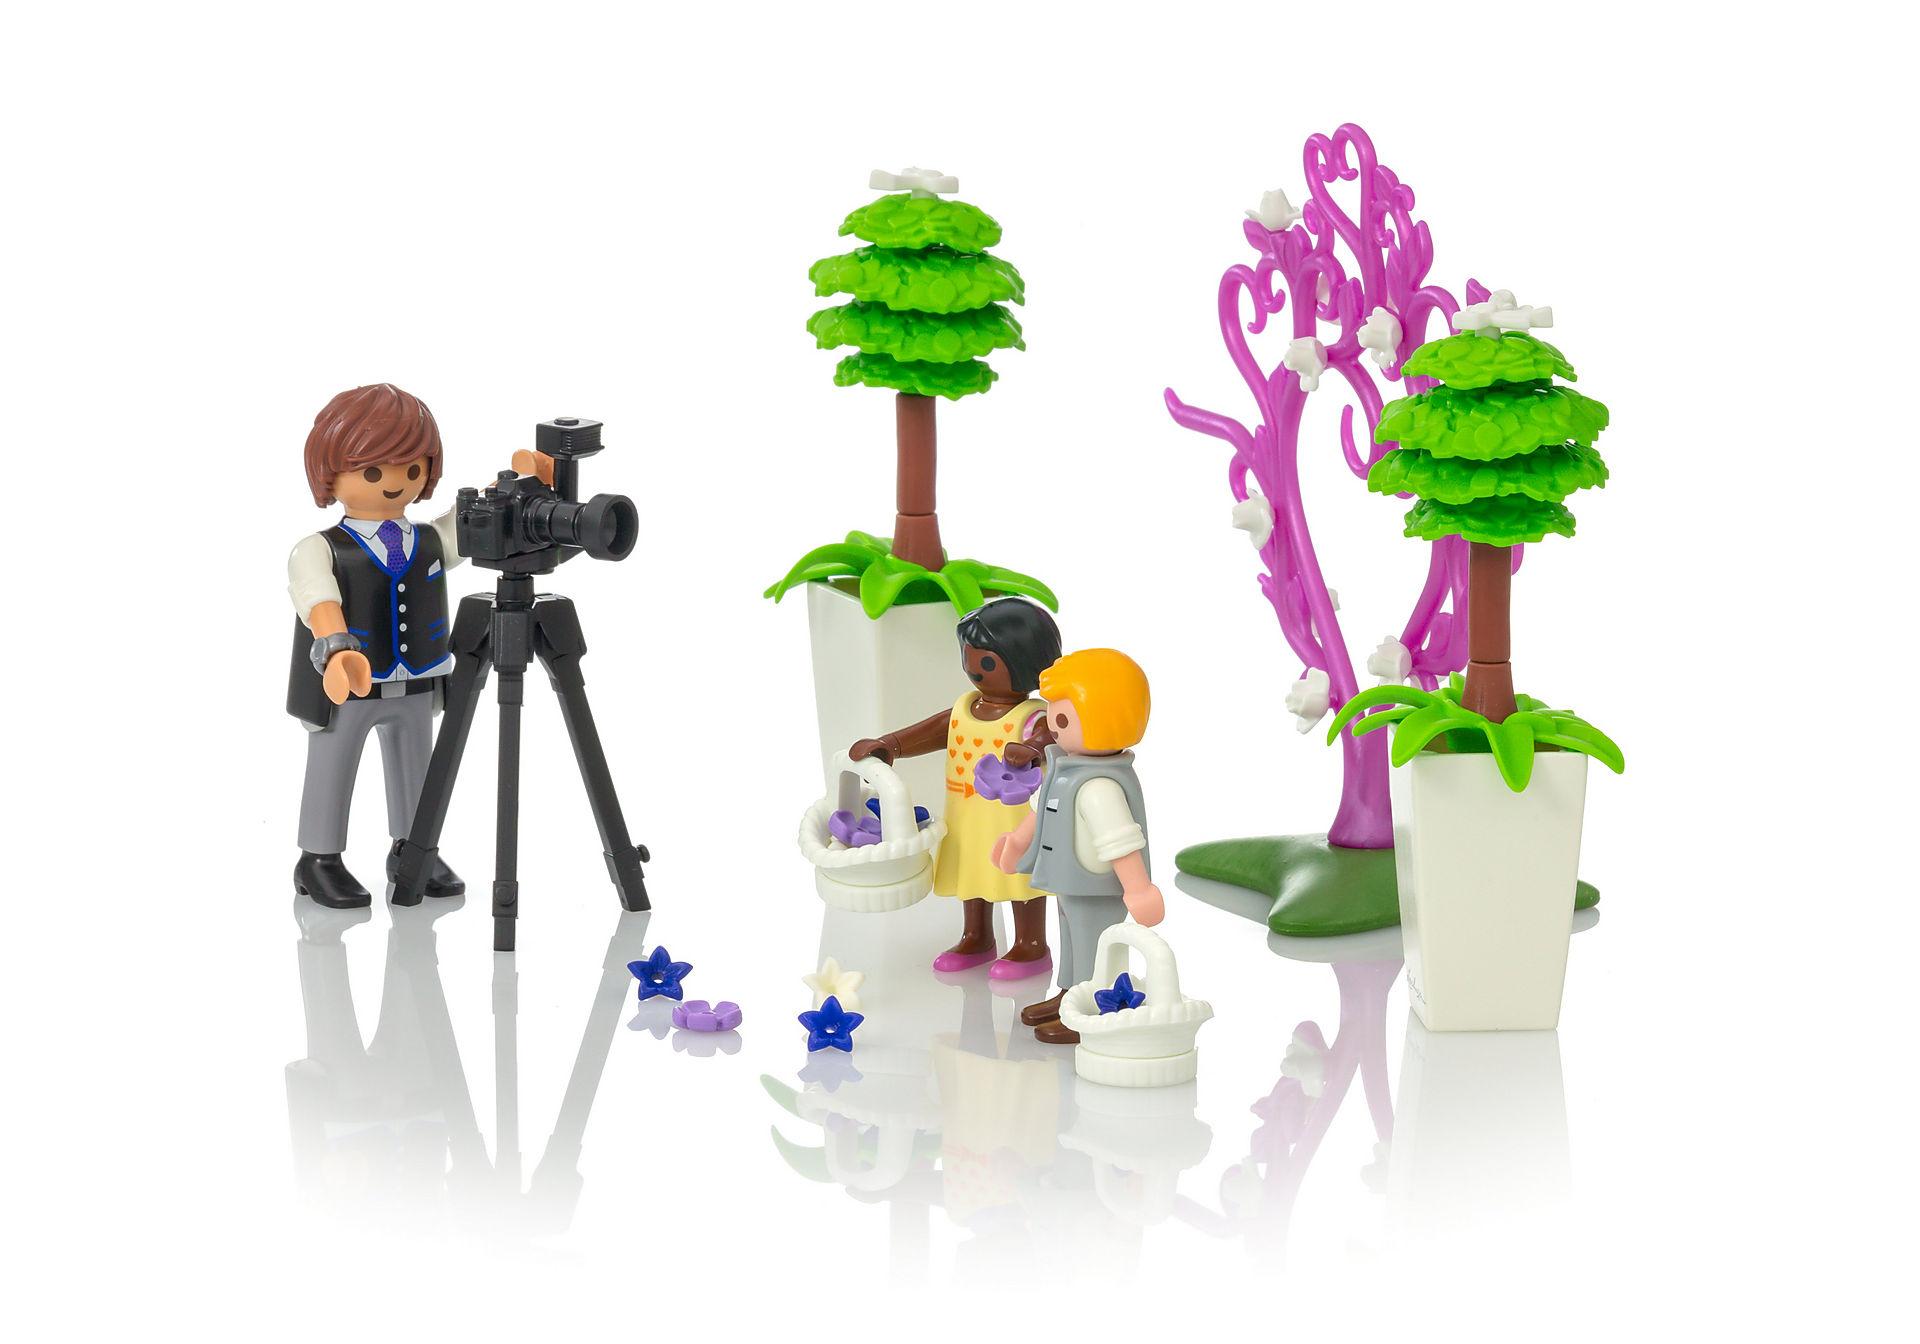 360degree image 3